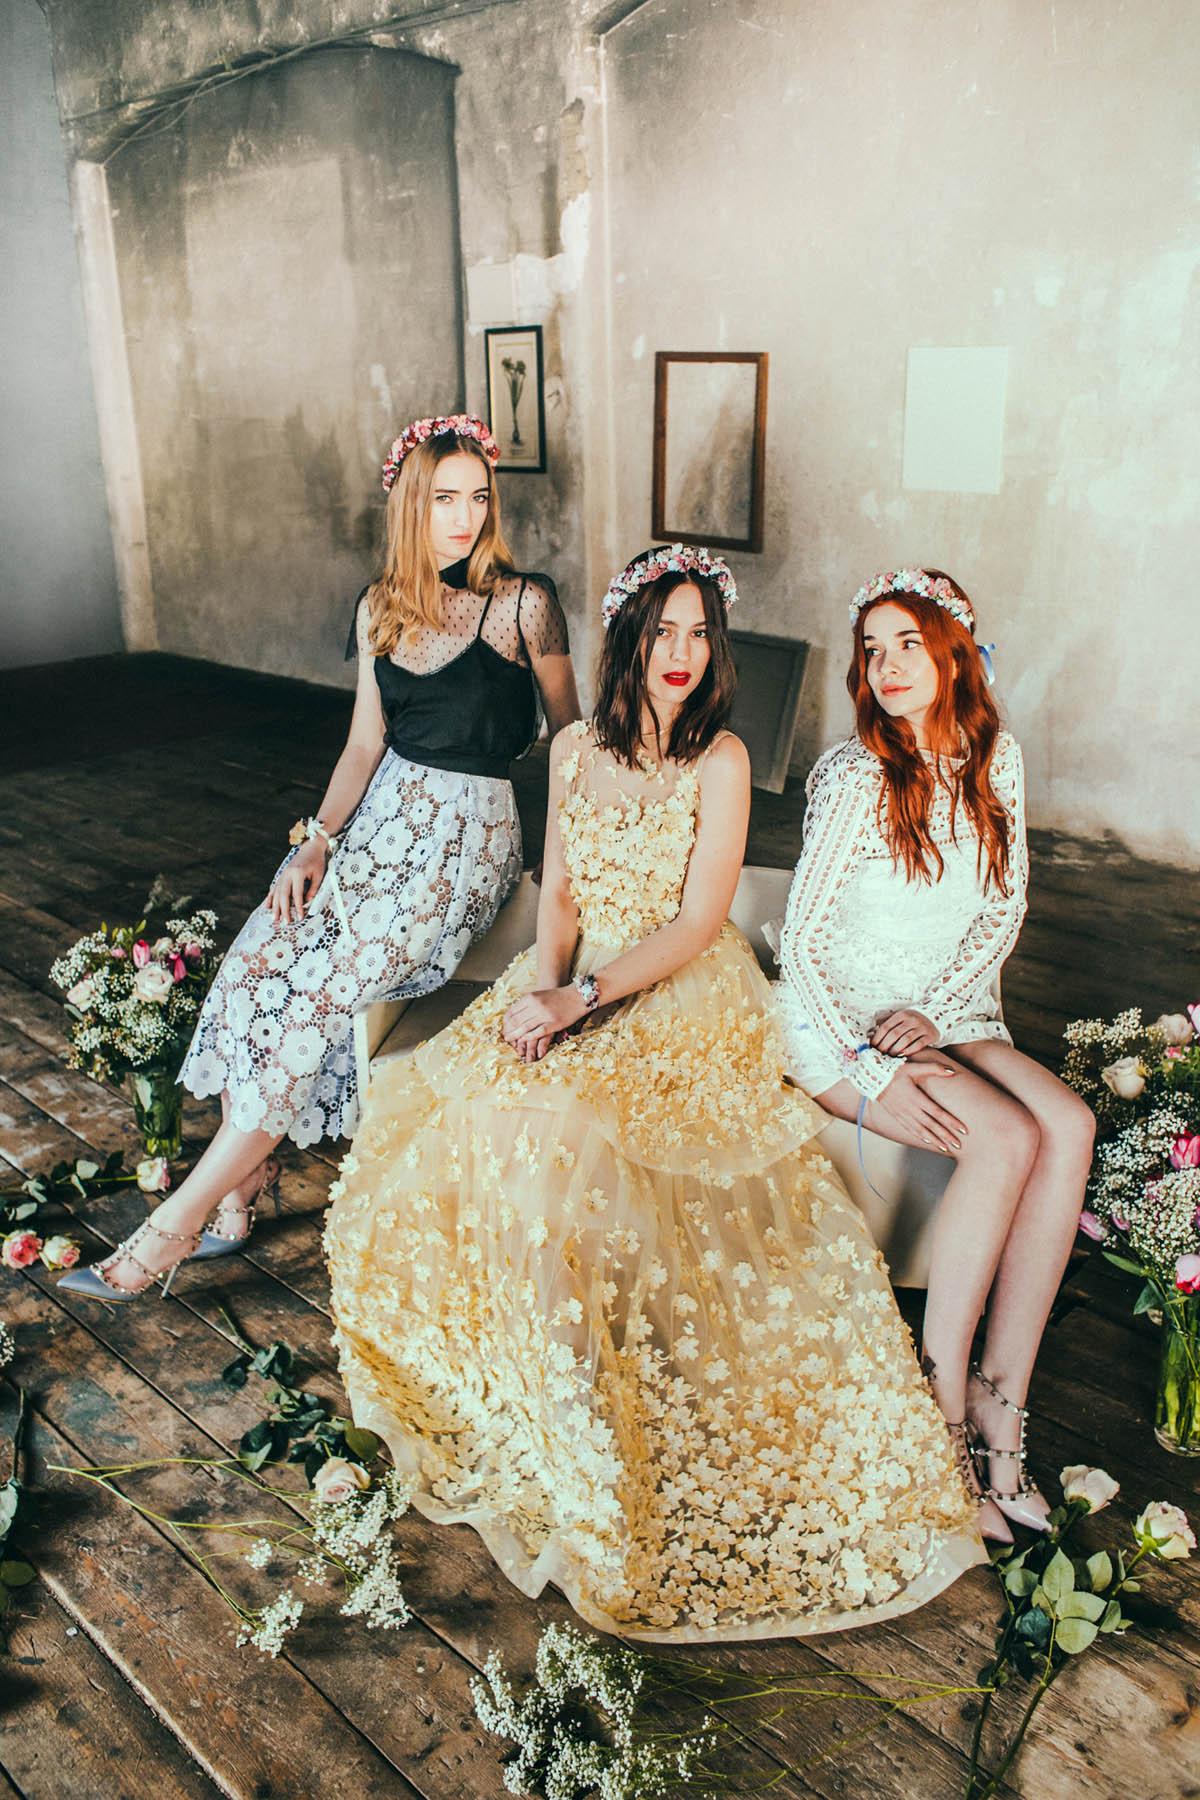 We-Are-Flowergirls_Lookbook_Flowercrown_Blumenkranz_SS17_c_Lupi-Spuma_Web_13.jpg